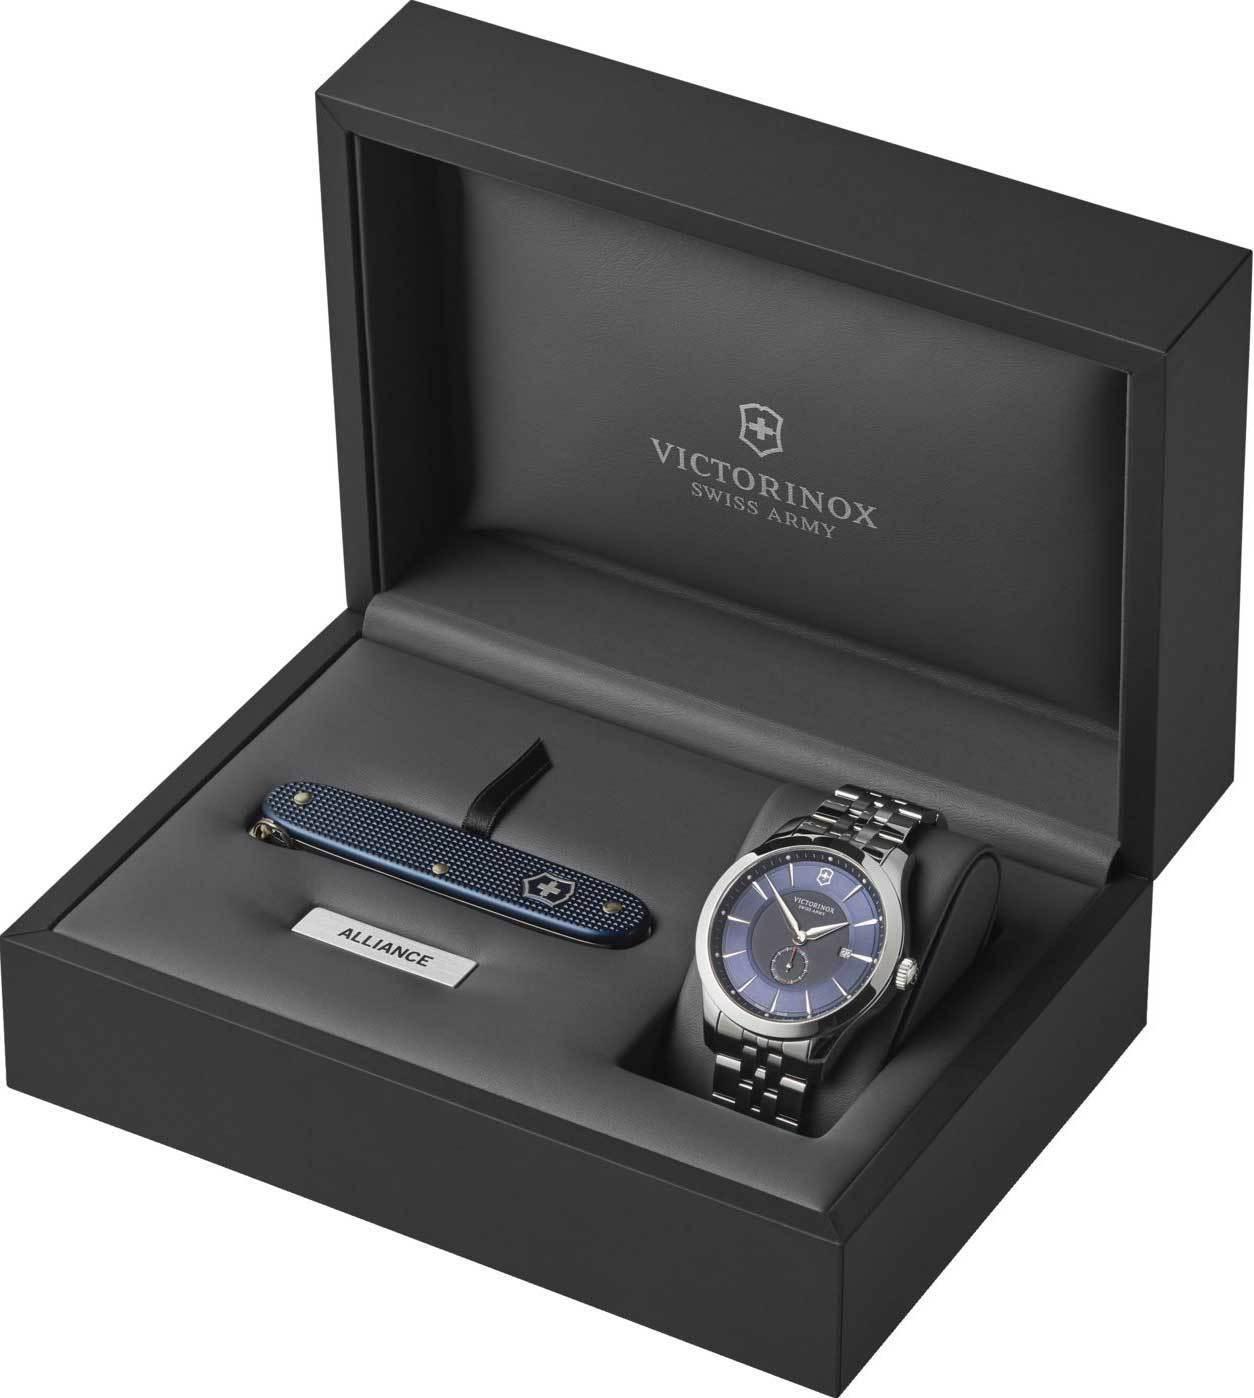 Мужские часы Victorinox Alliance в комплекте швейцарский армейский нож Pioneer 241763.1